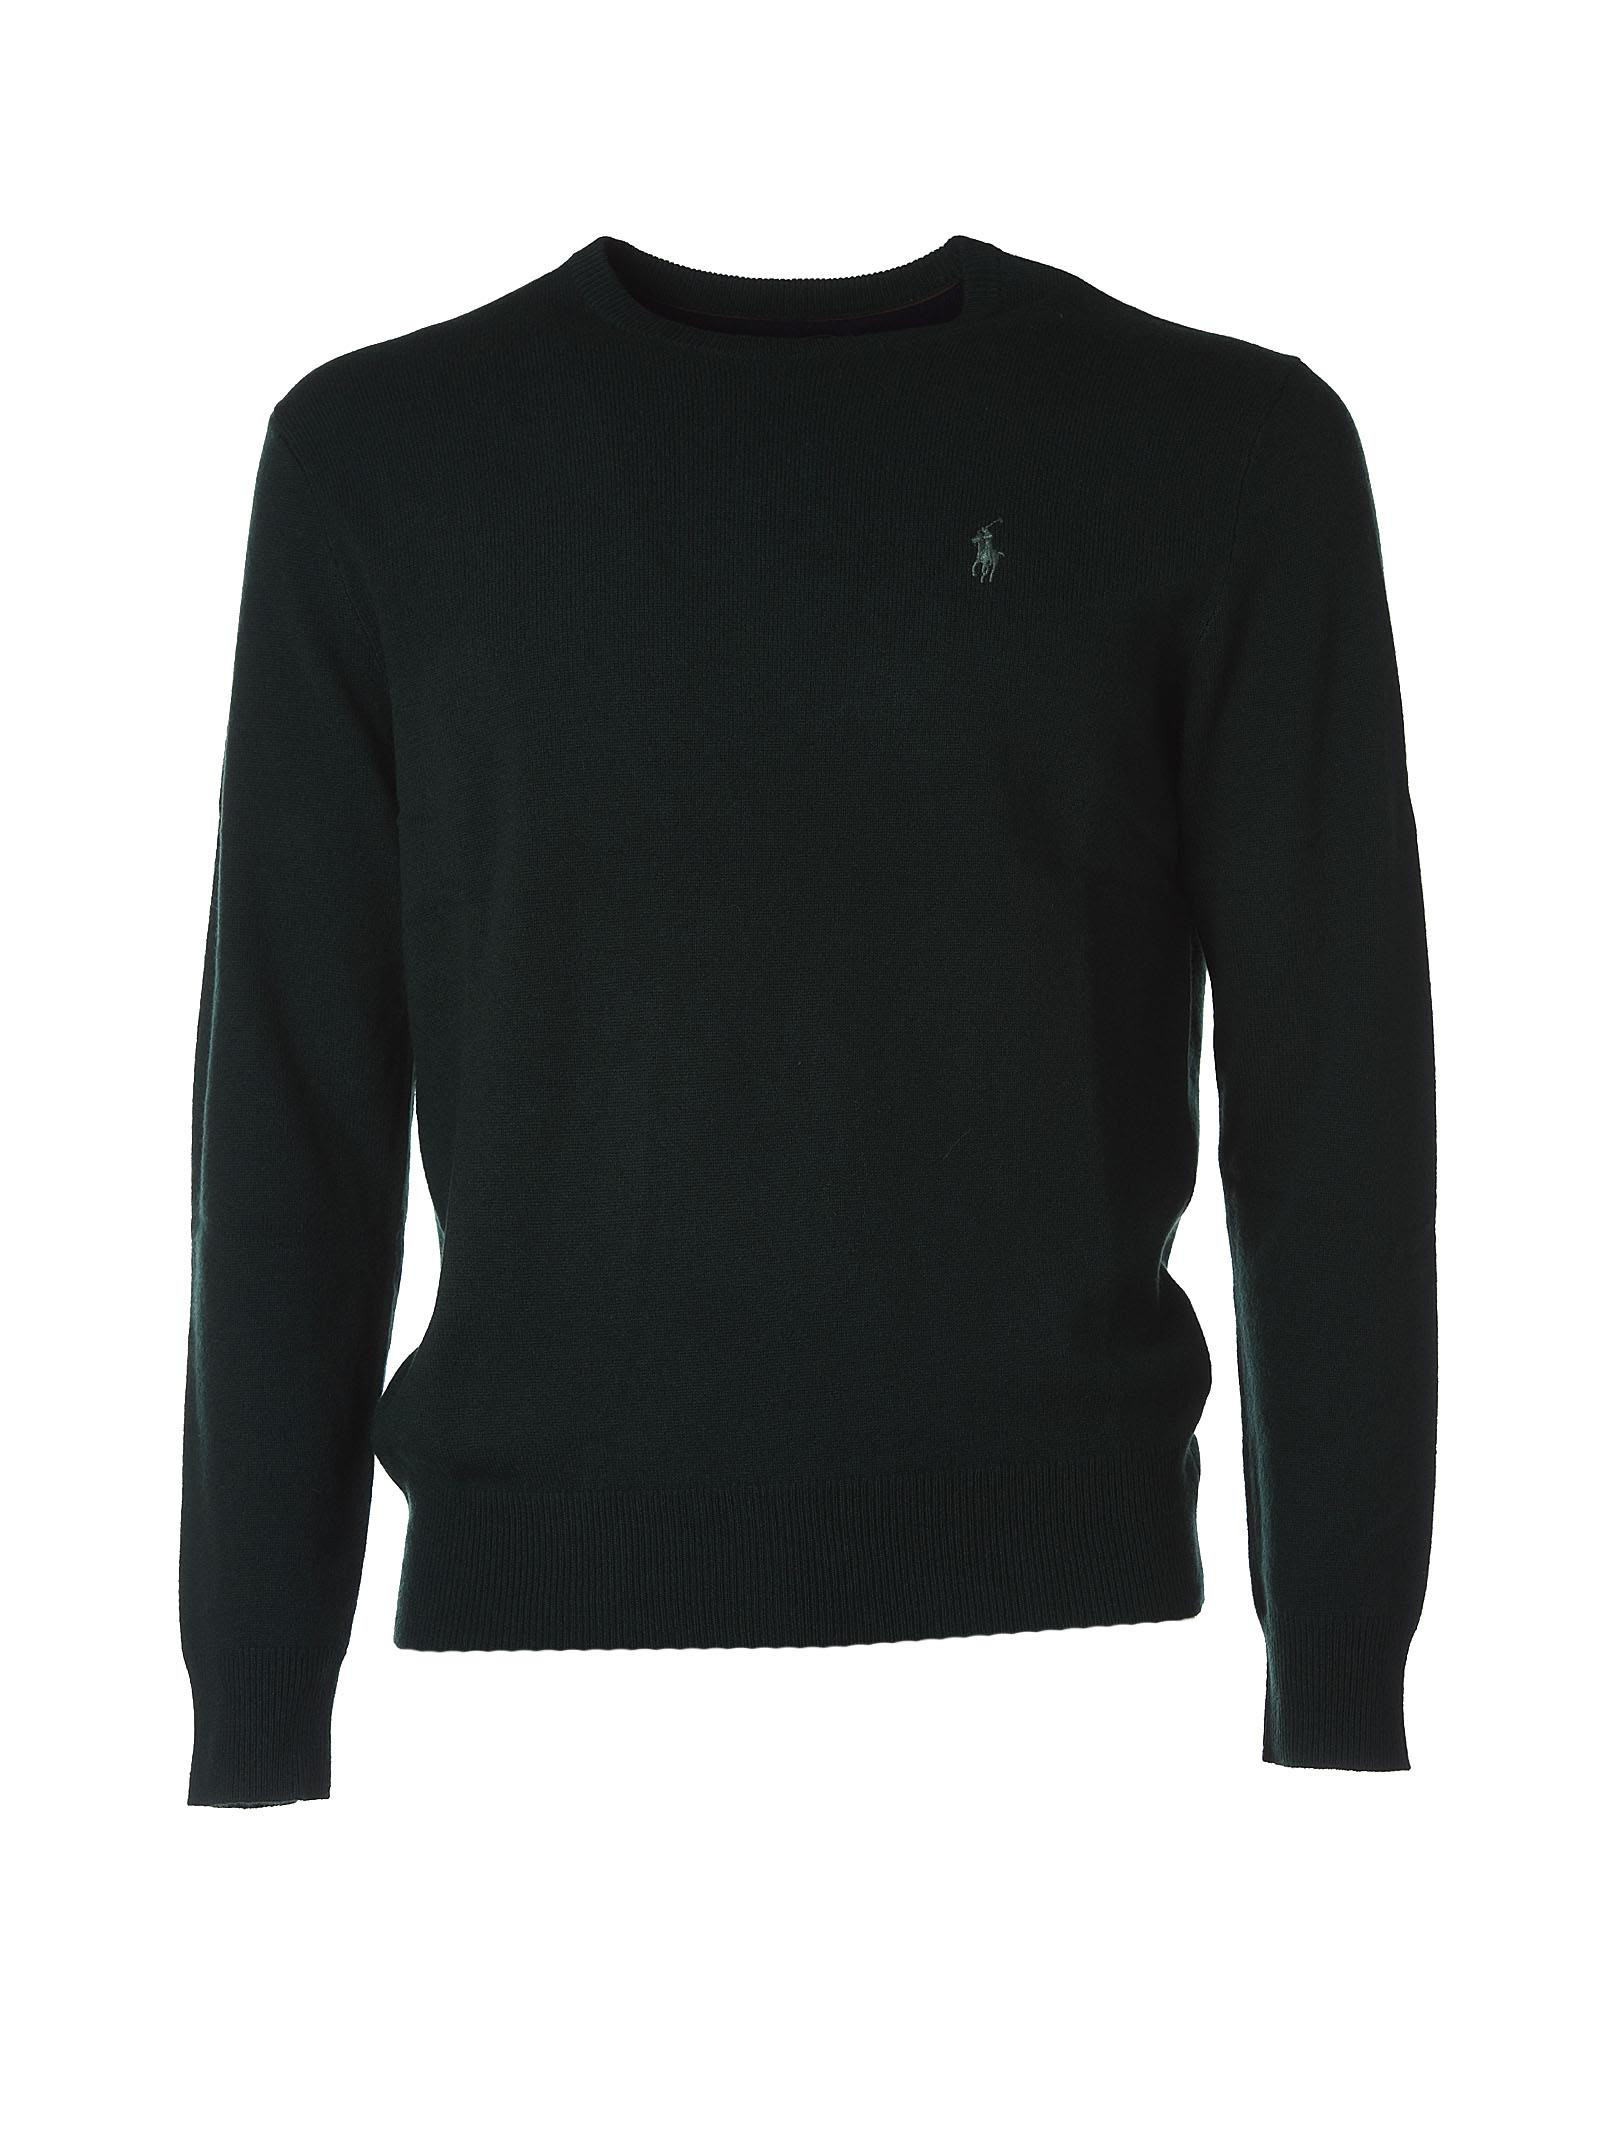 Polo Ralph Lauren Green Round Neck Sweater